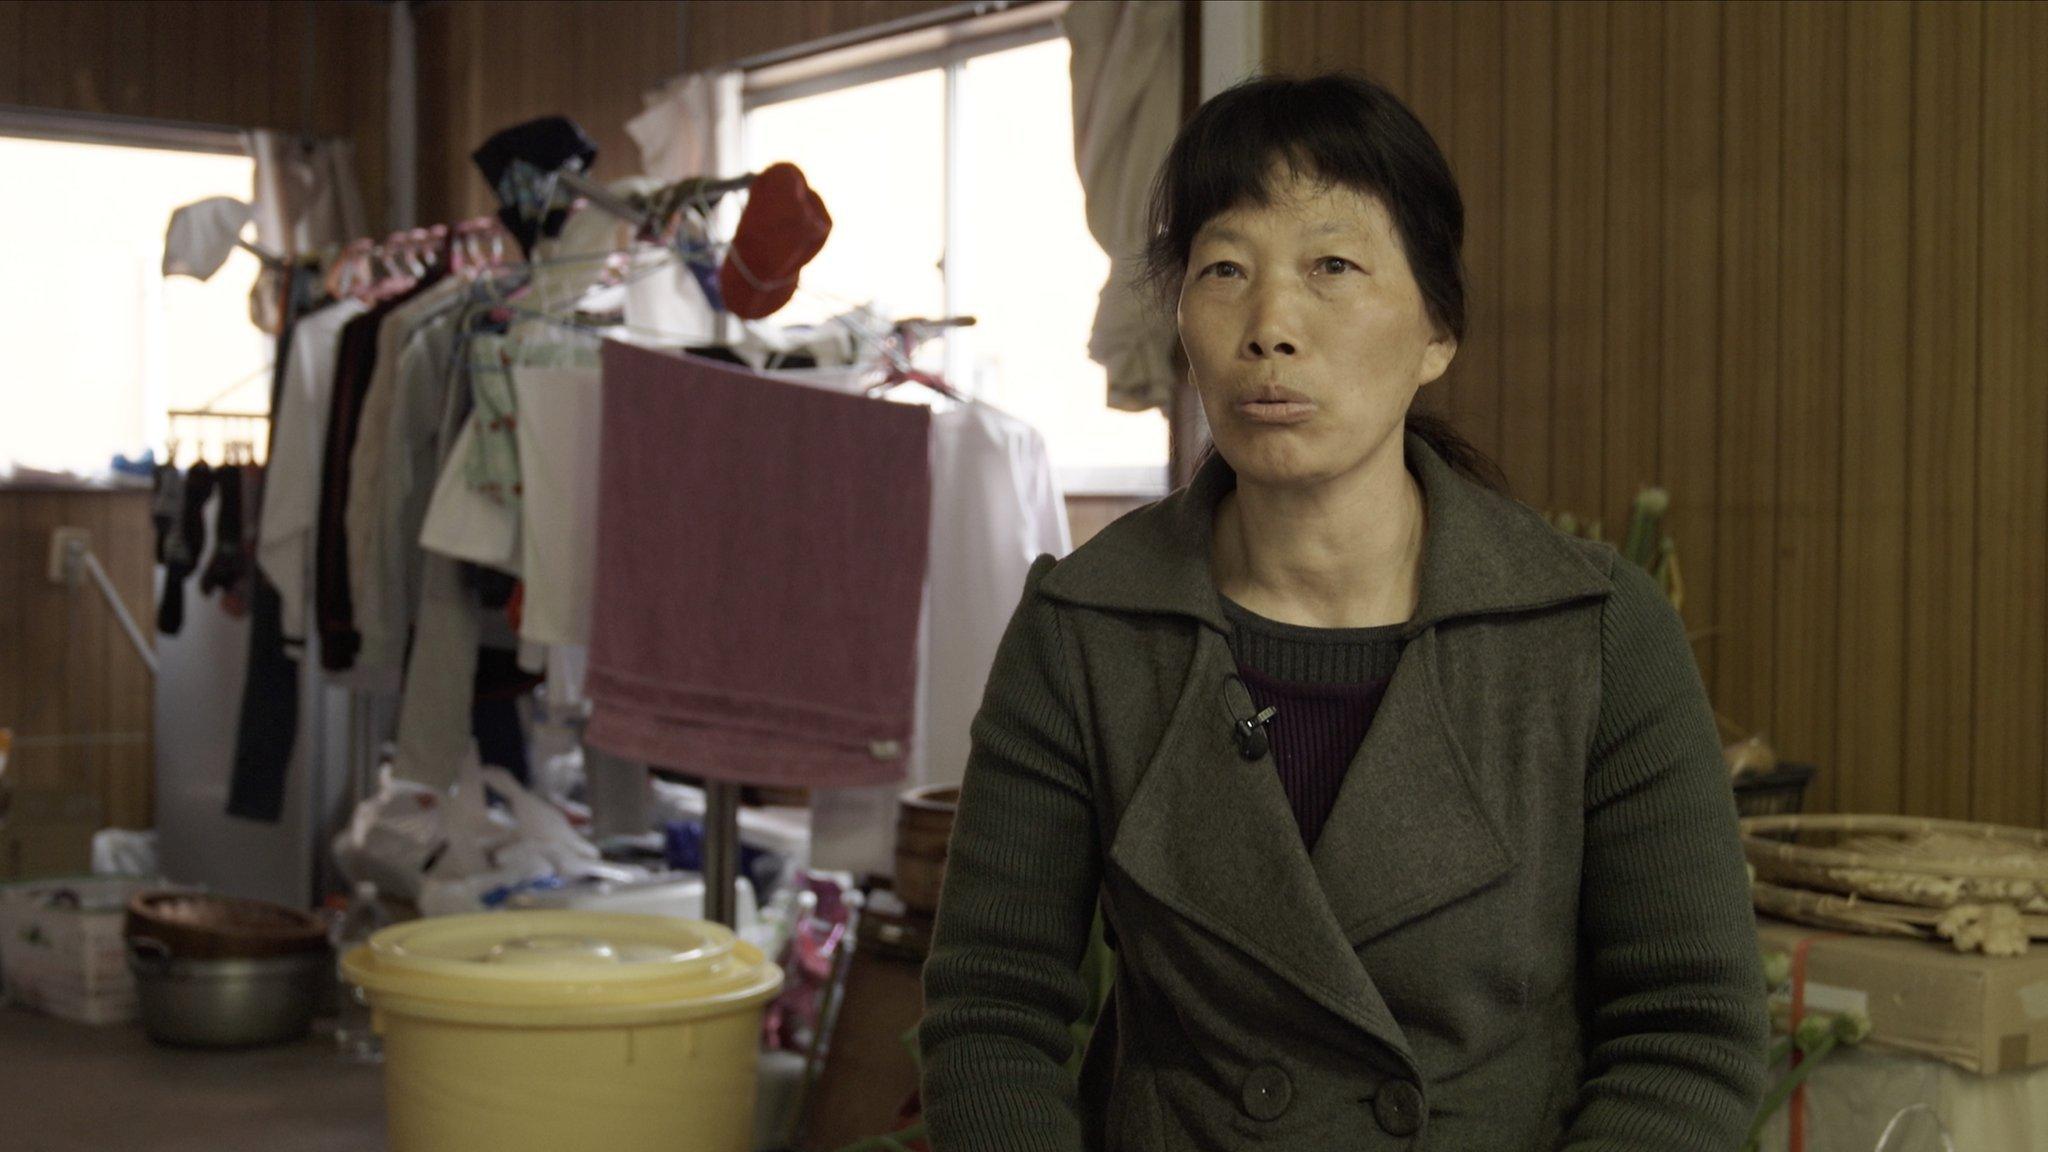 Pekerja China di Jepang, Zhang